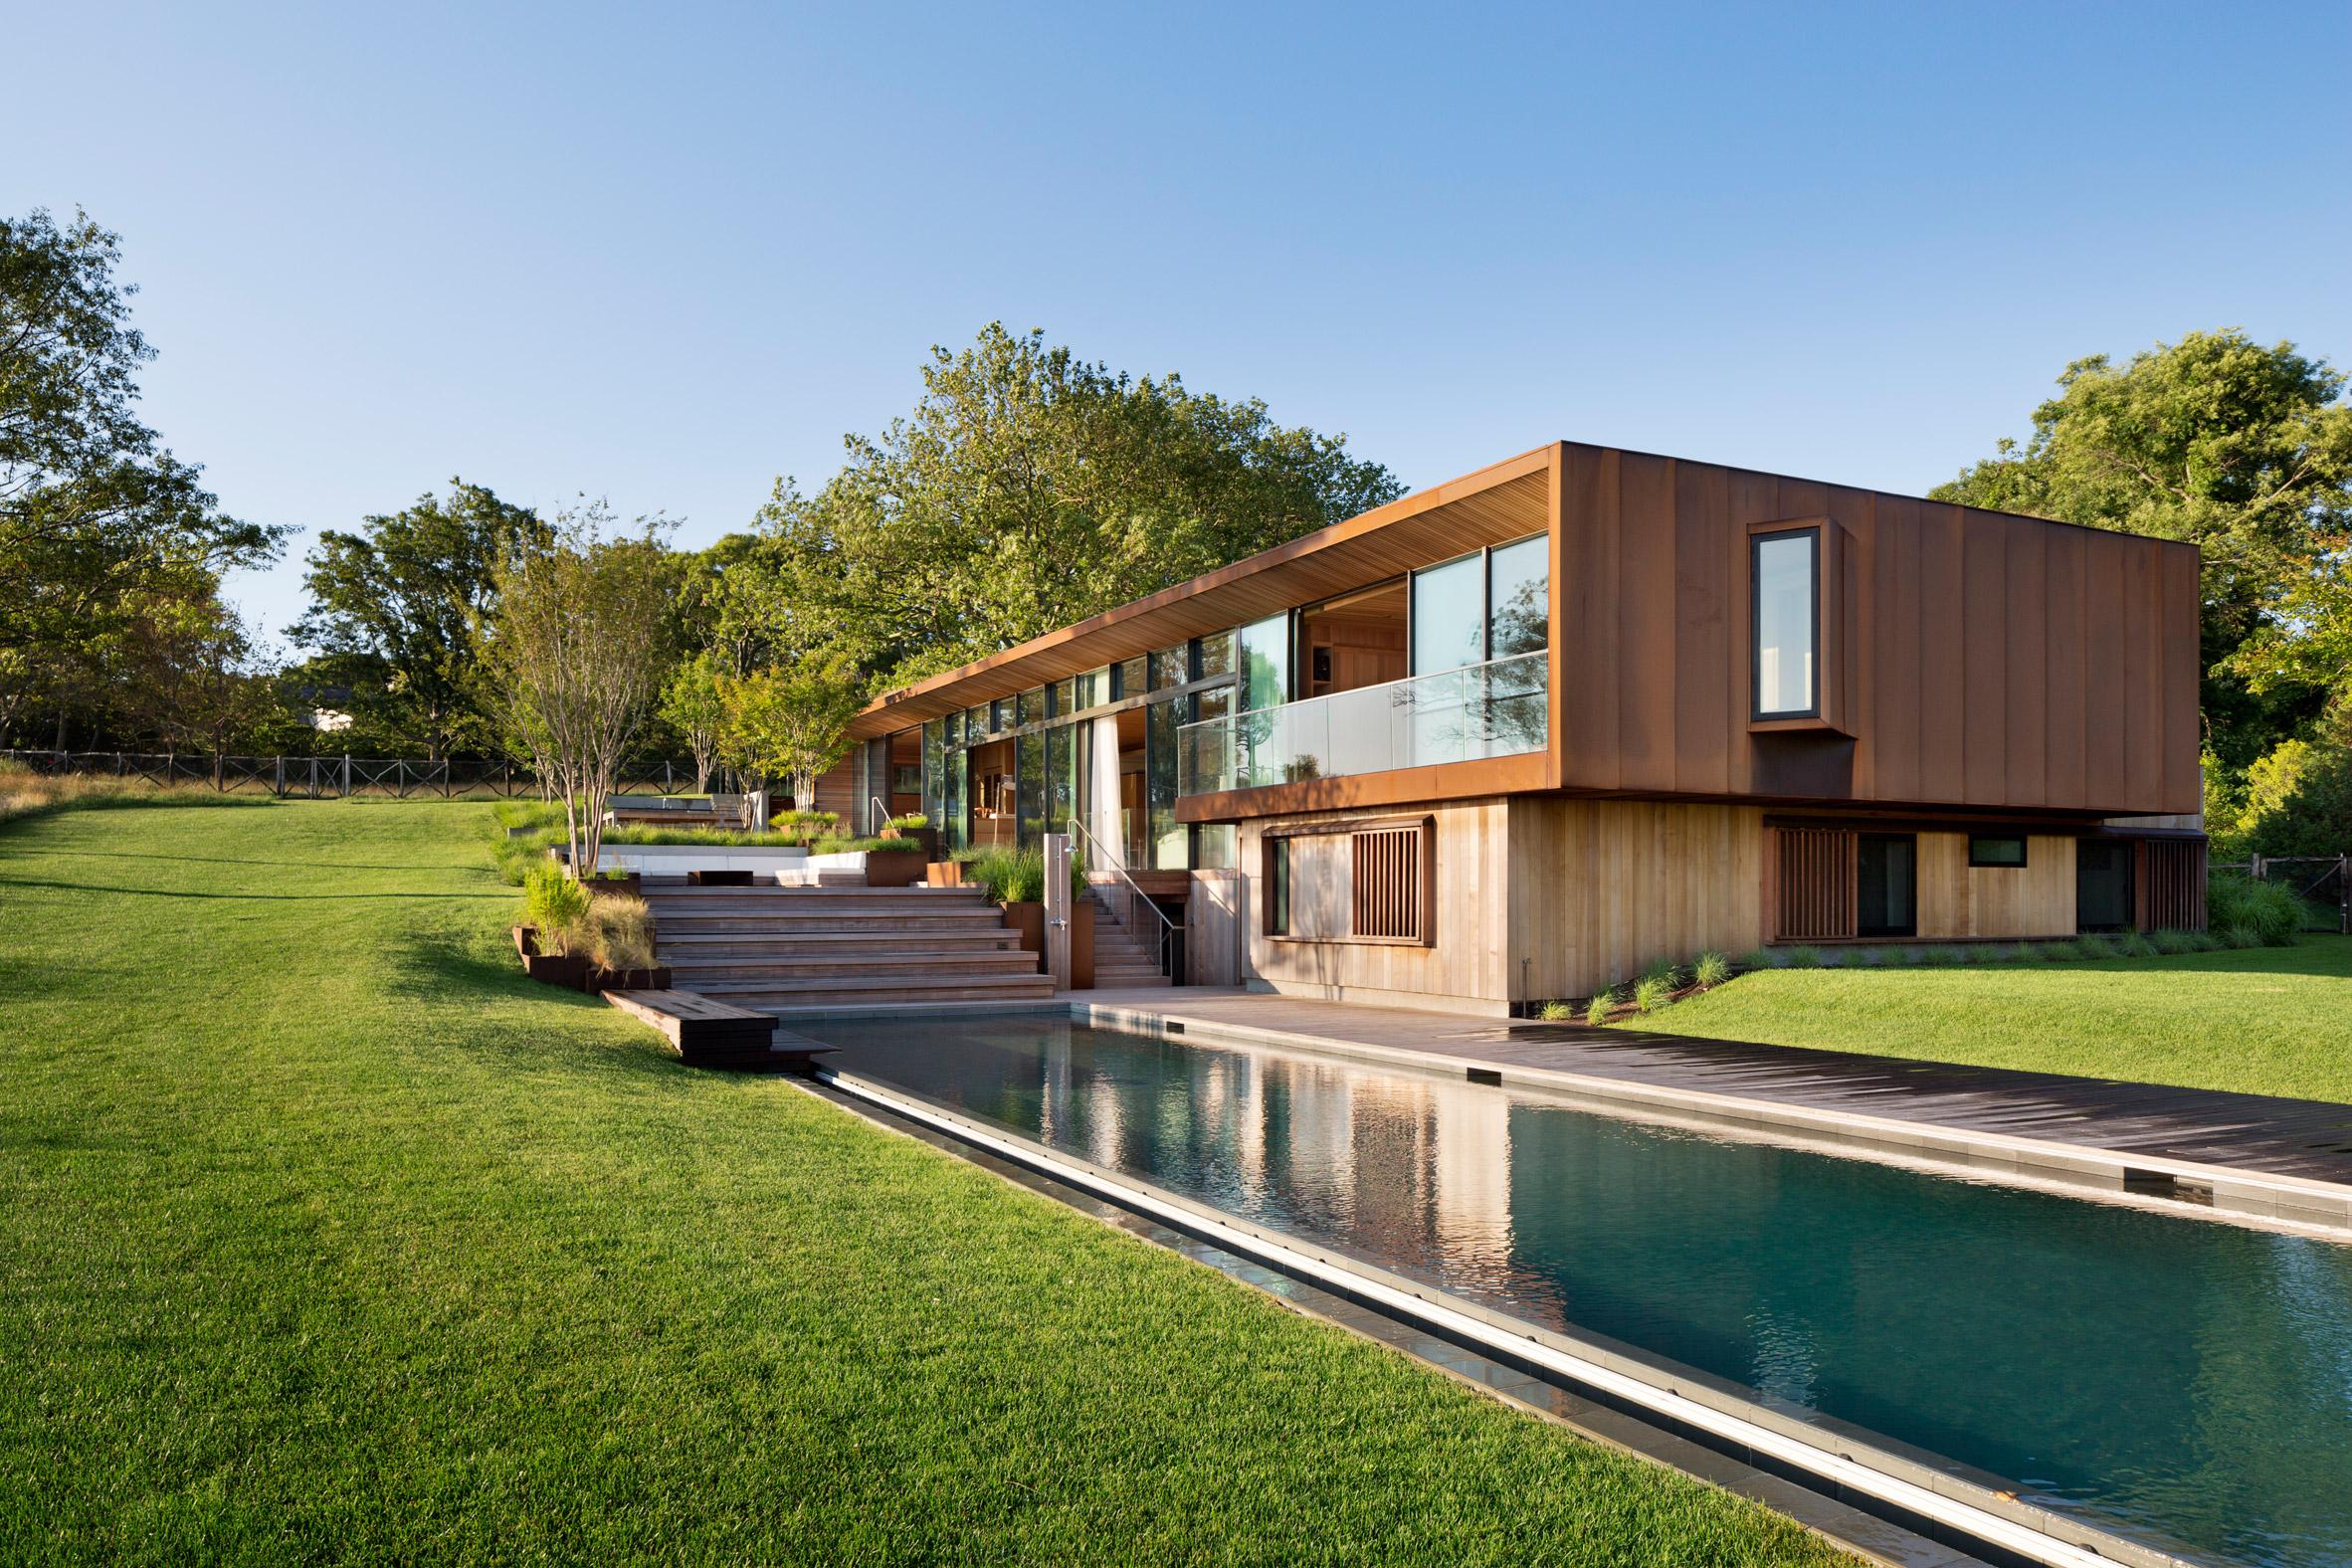 peconic-house-mapos-studio-hamptons-long-island-new-york_dezeen_2364_col_12.jpg